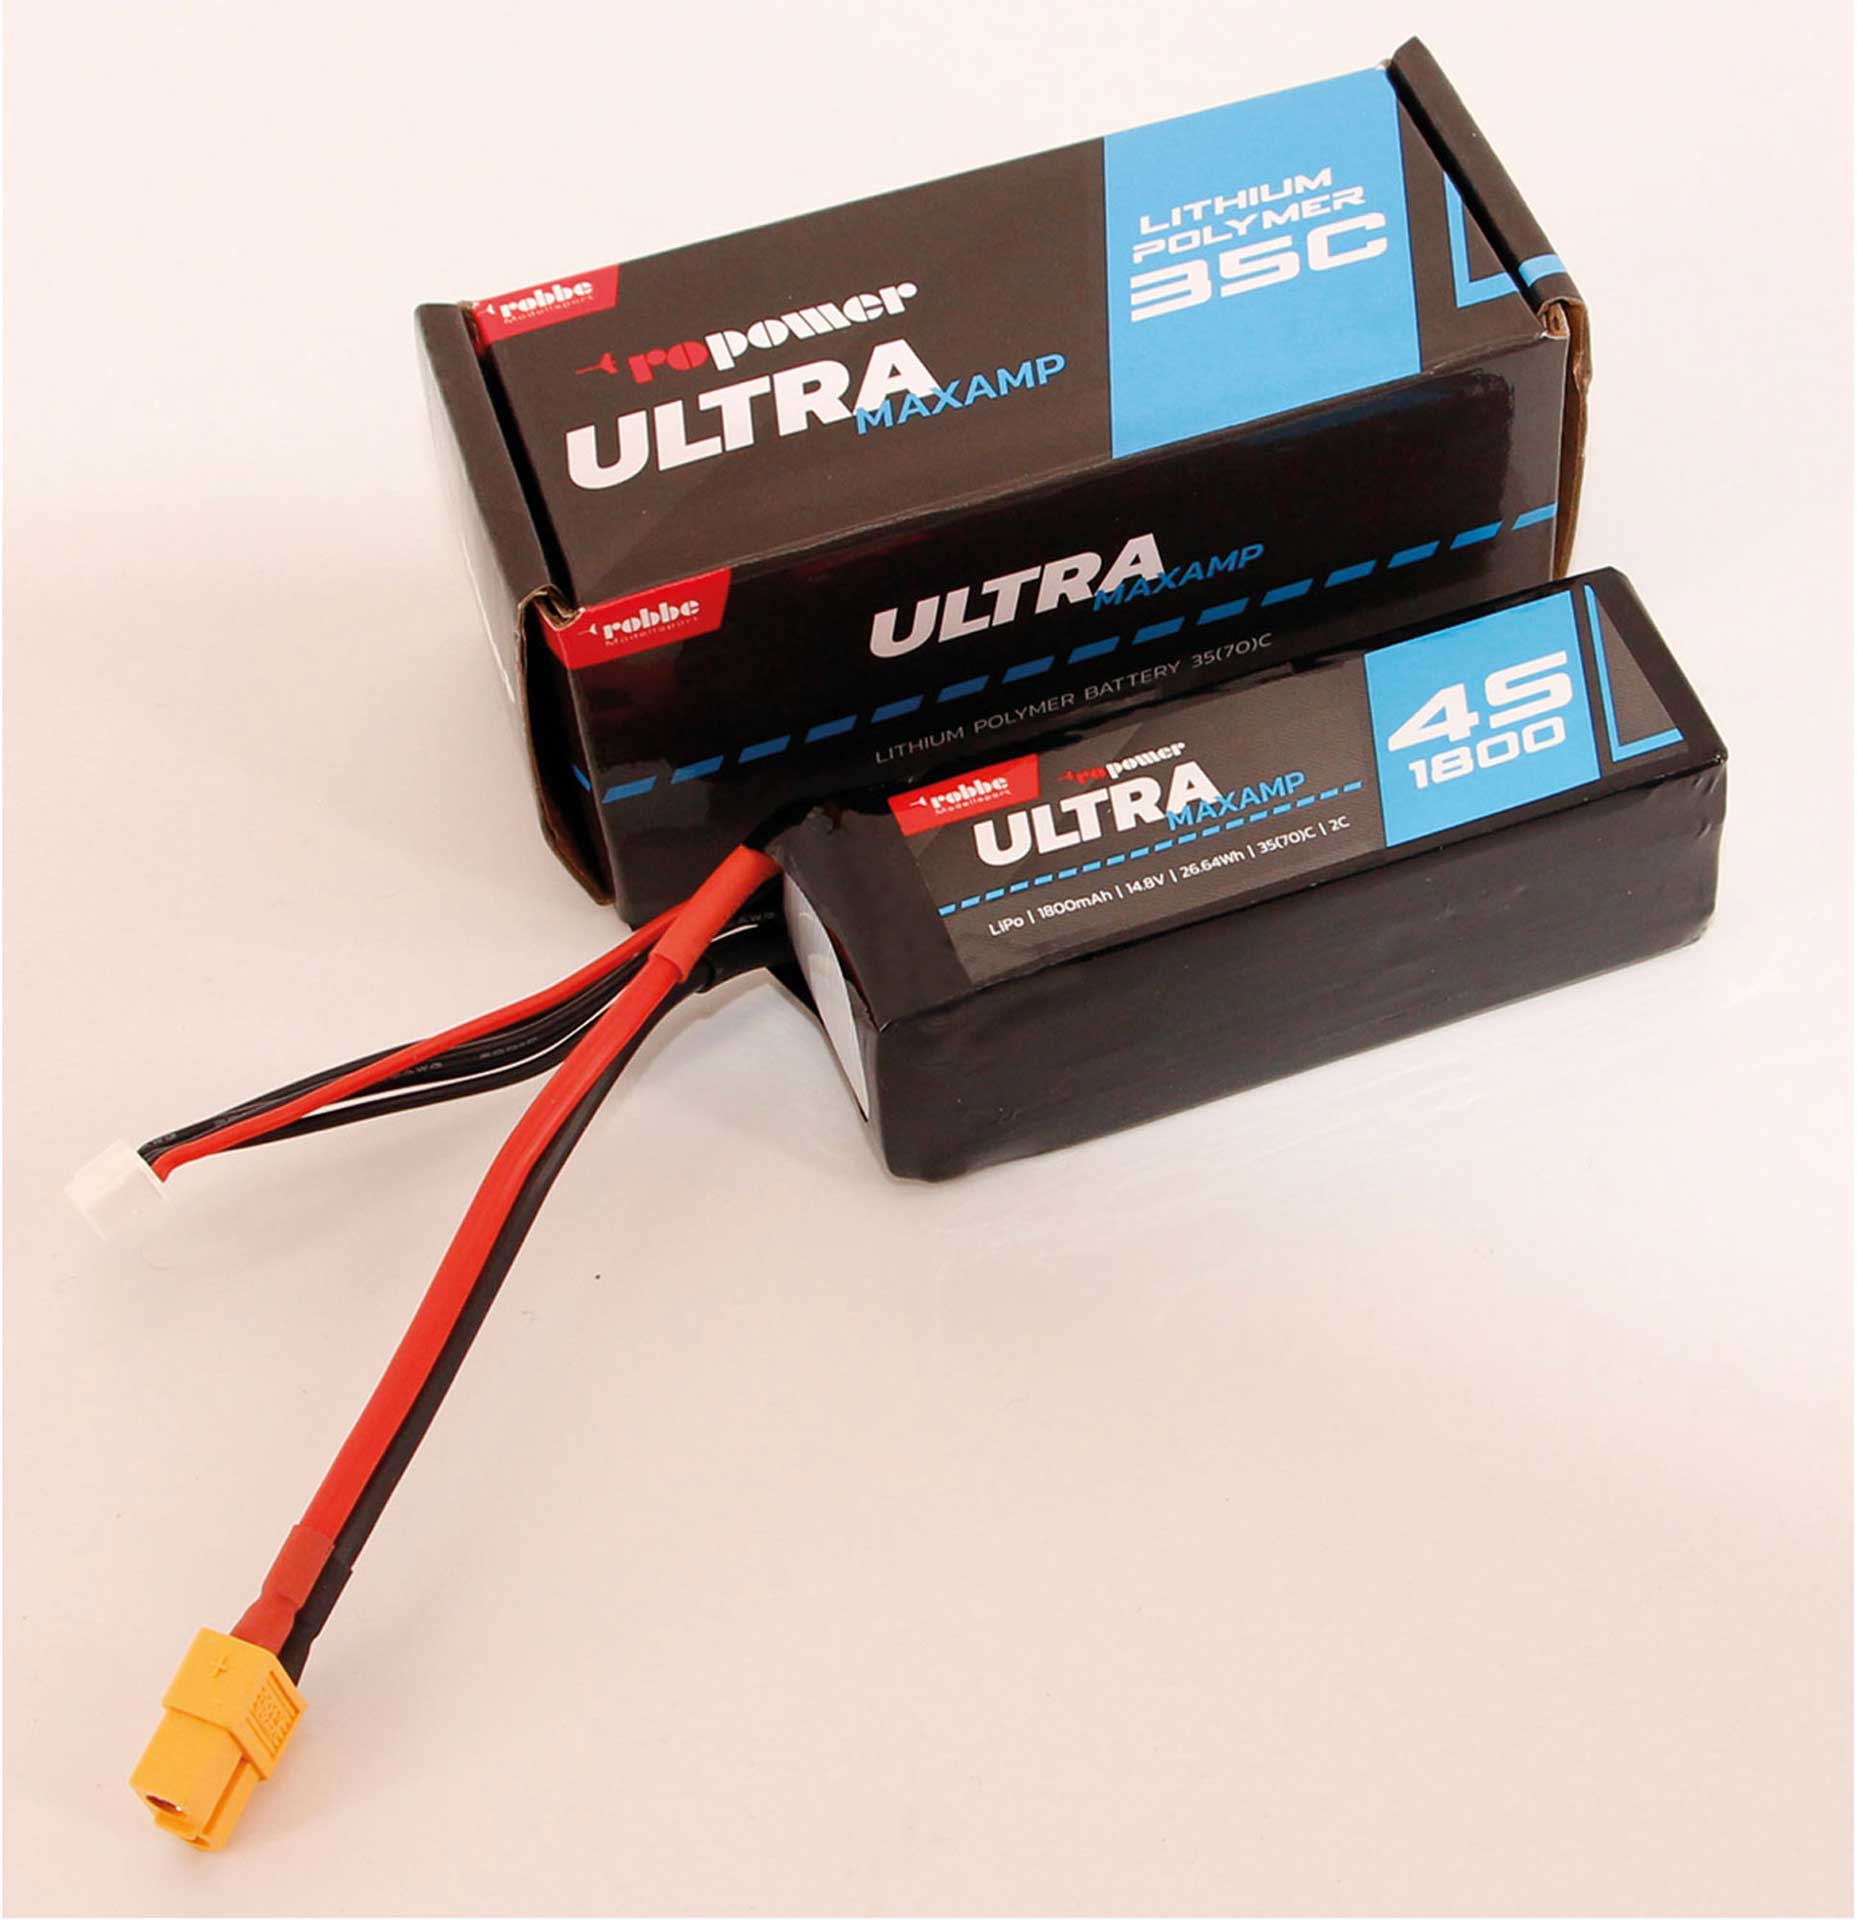 Robbe Modellsport RO-POWER ULTRA MAXAMP 1800MAH 14,8 VOLT 4S 35(70)C LIPO AKKU